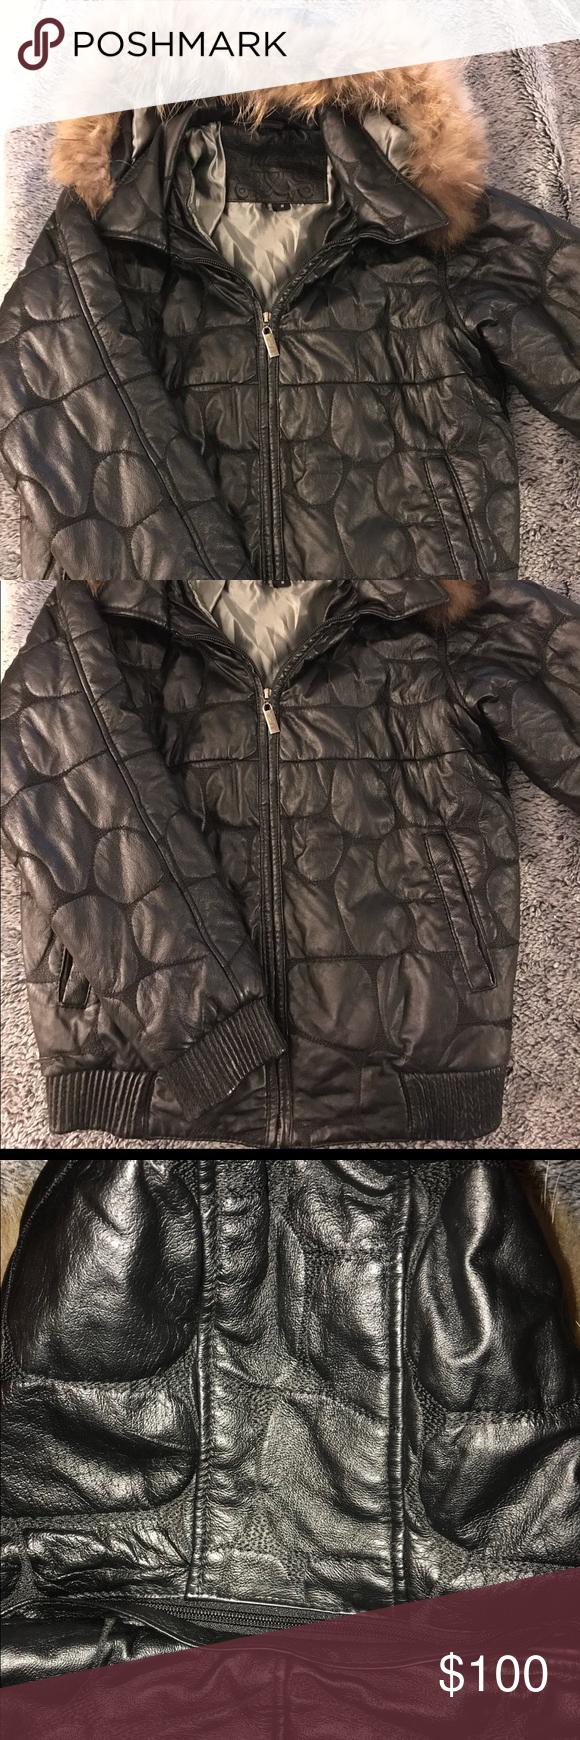 Vilanto Genuine Leather Jacket Genuine Leather Jackets Leather Jacket Genuine Leather [ 1740 x 580 Pixel ]